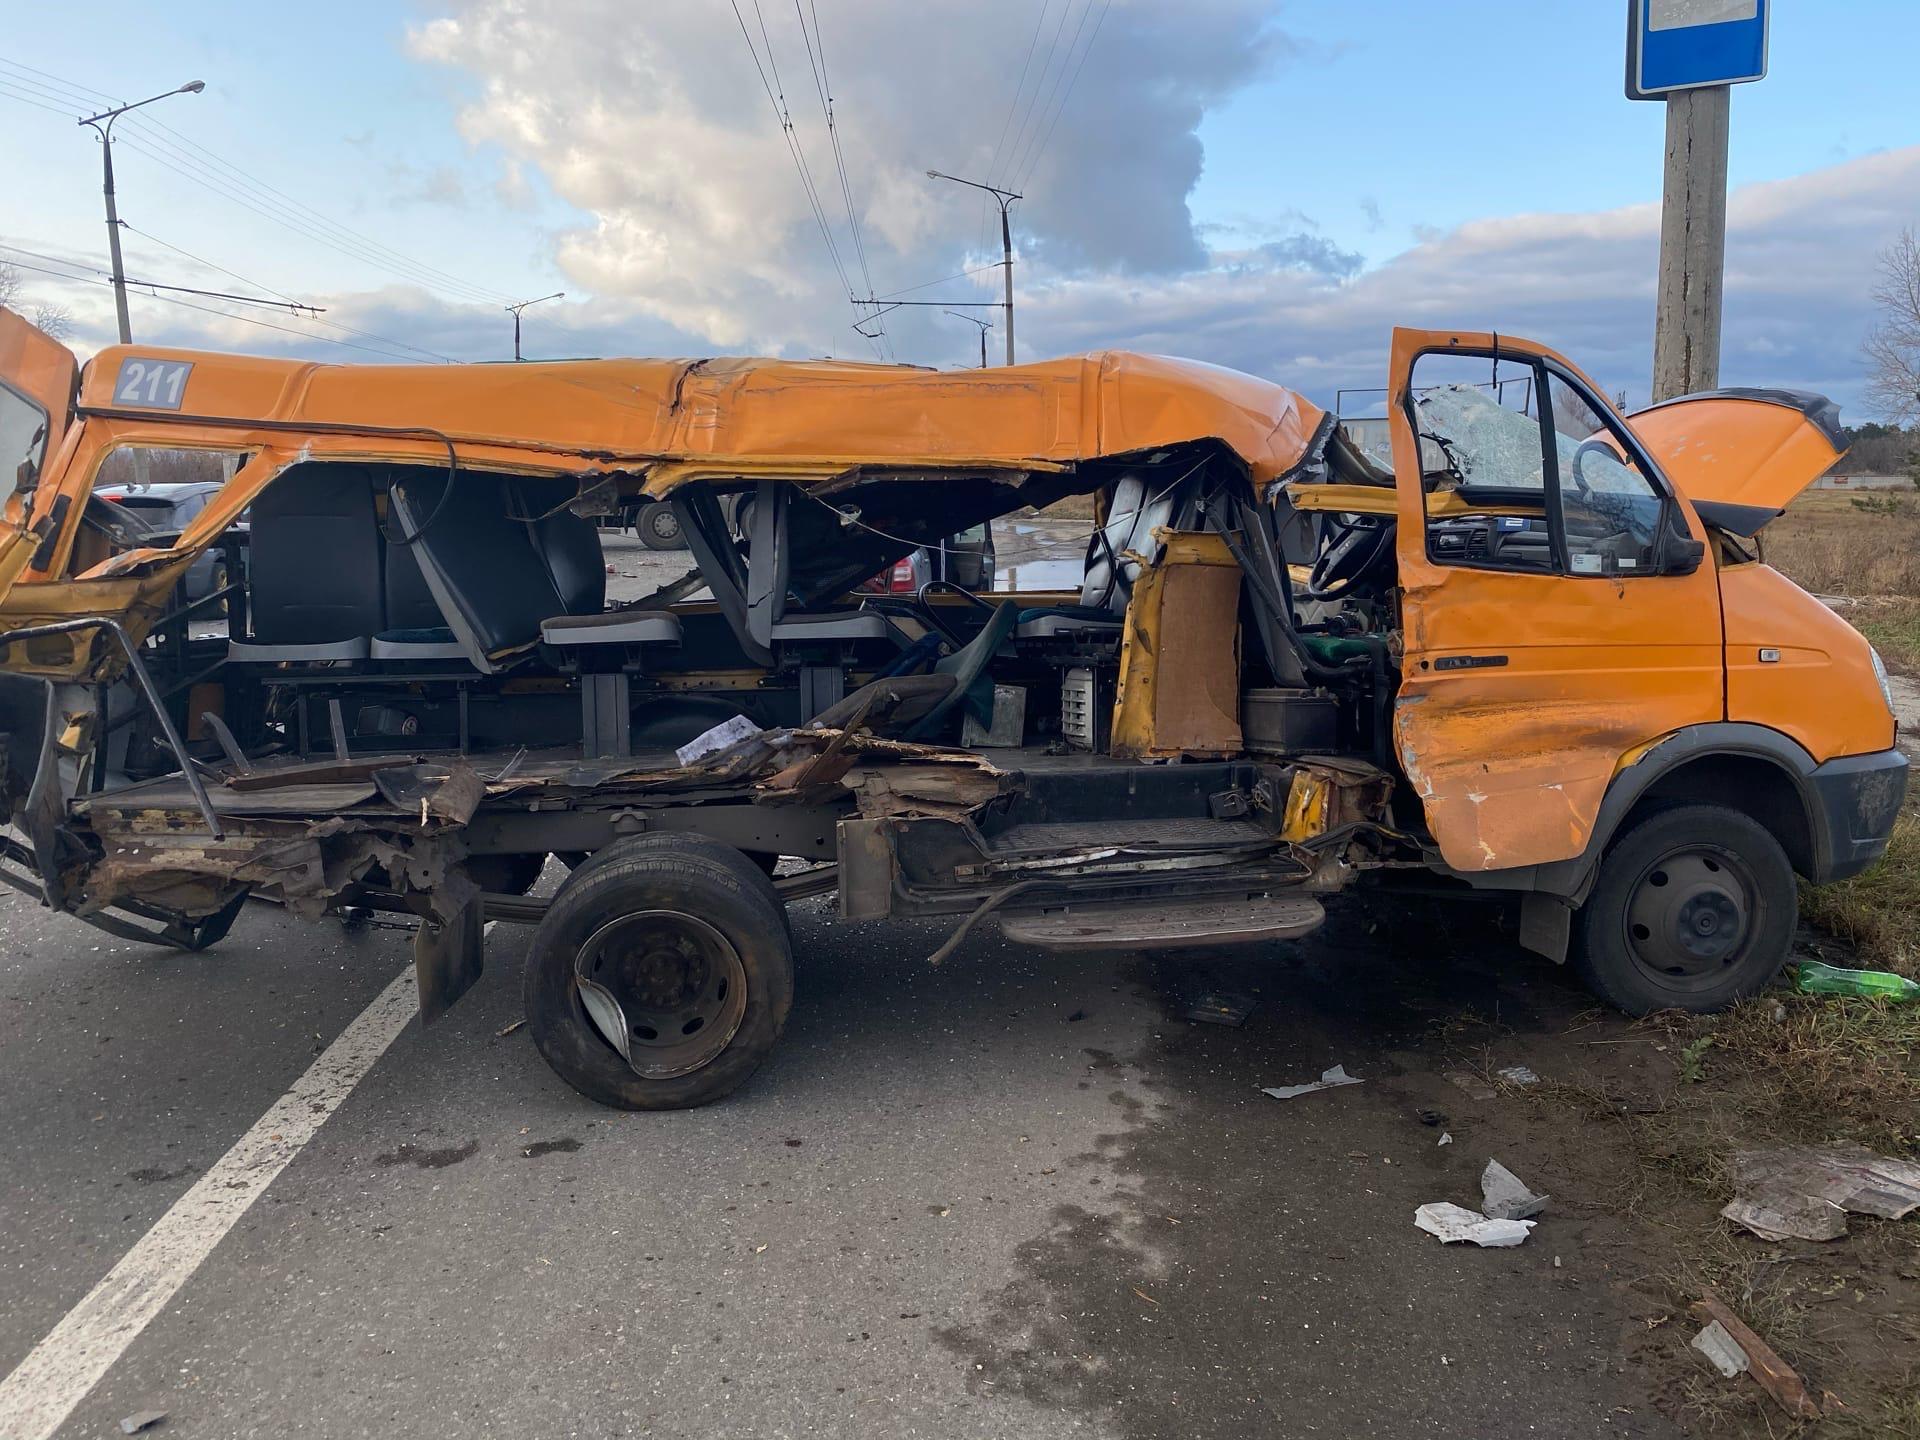 Пострадали пятеро: на шоссе в Тольятти грузовик разнес маршрутку